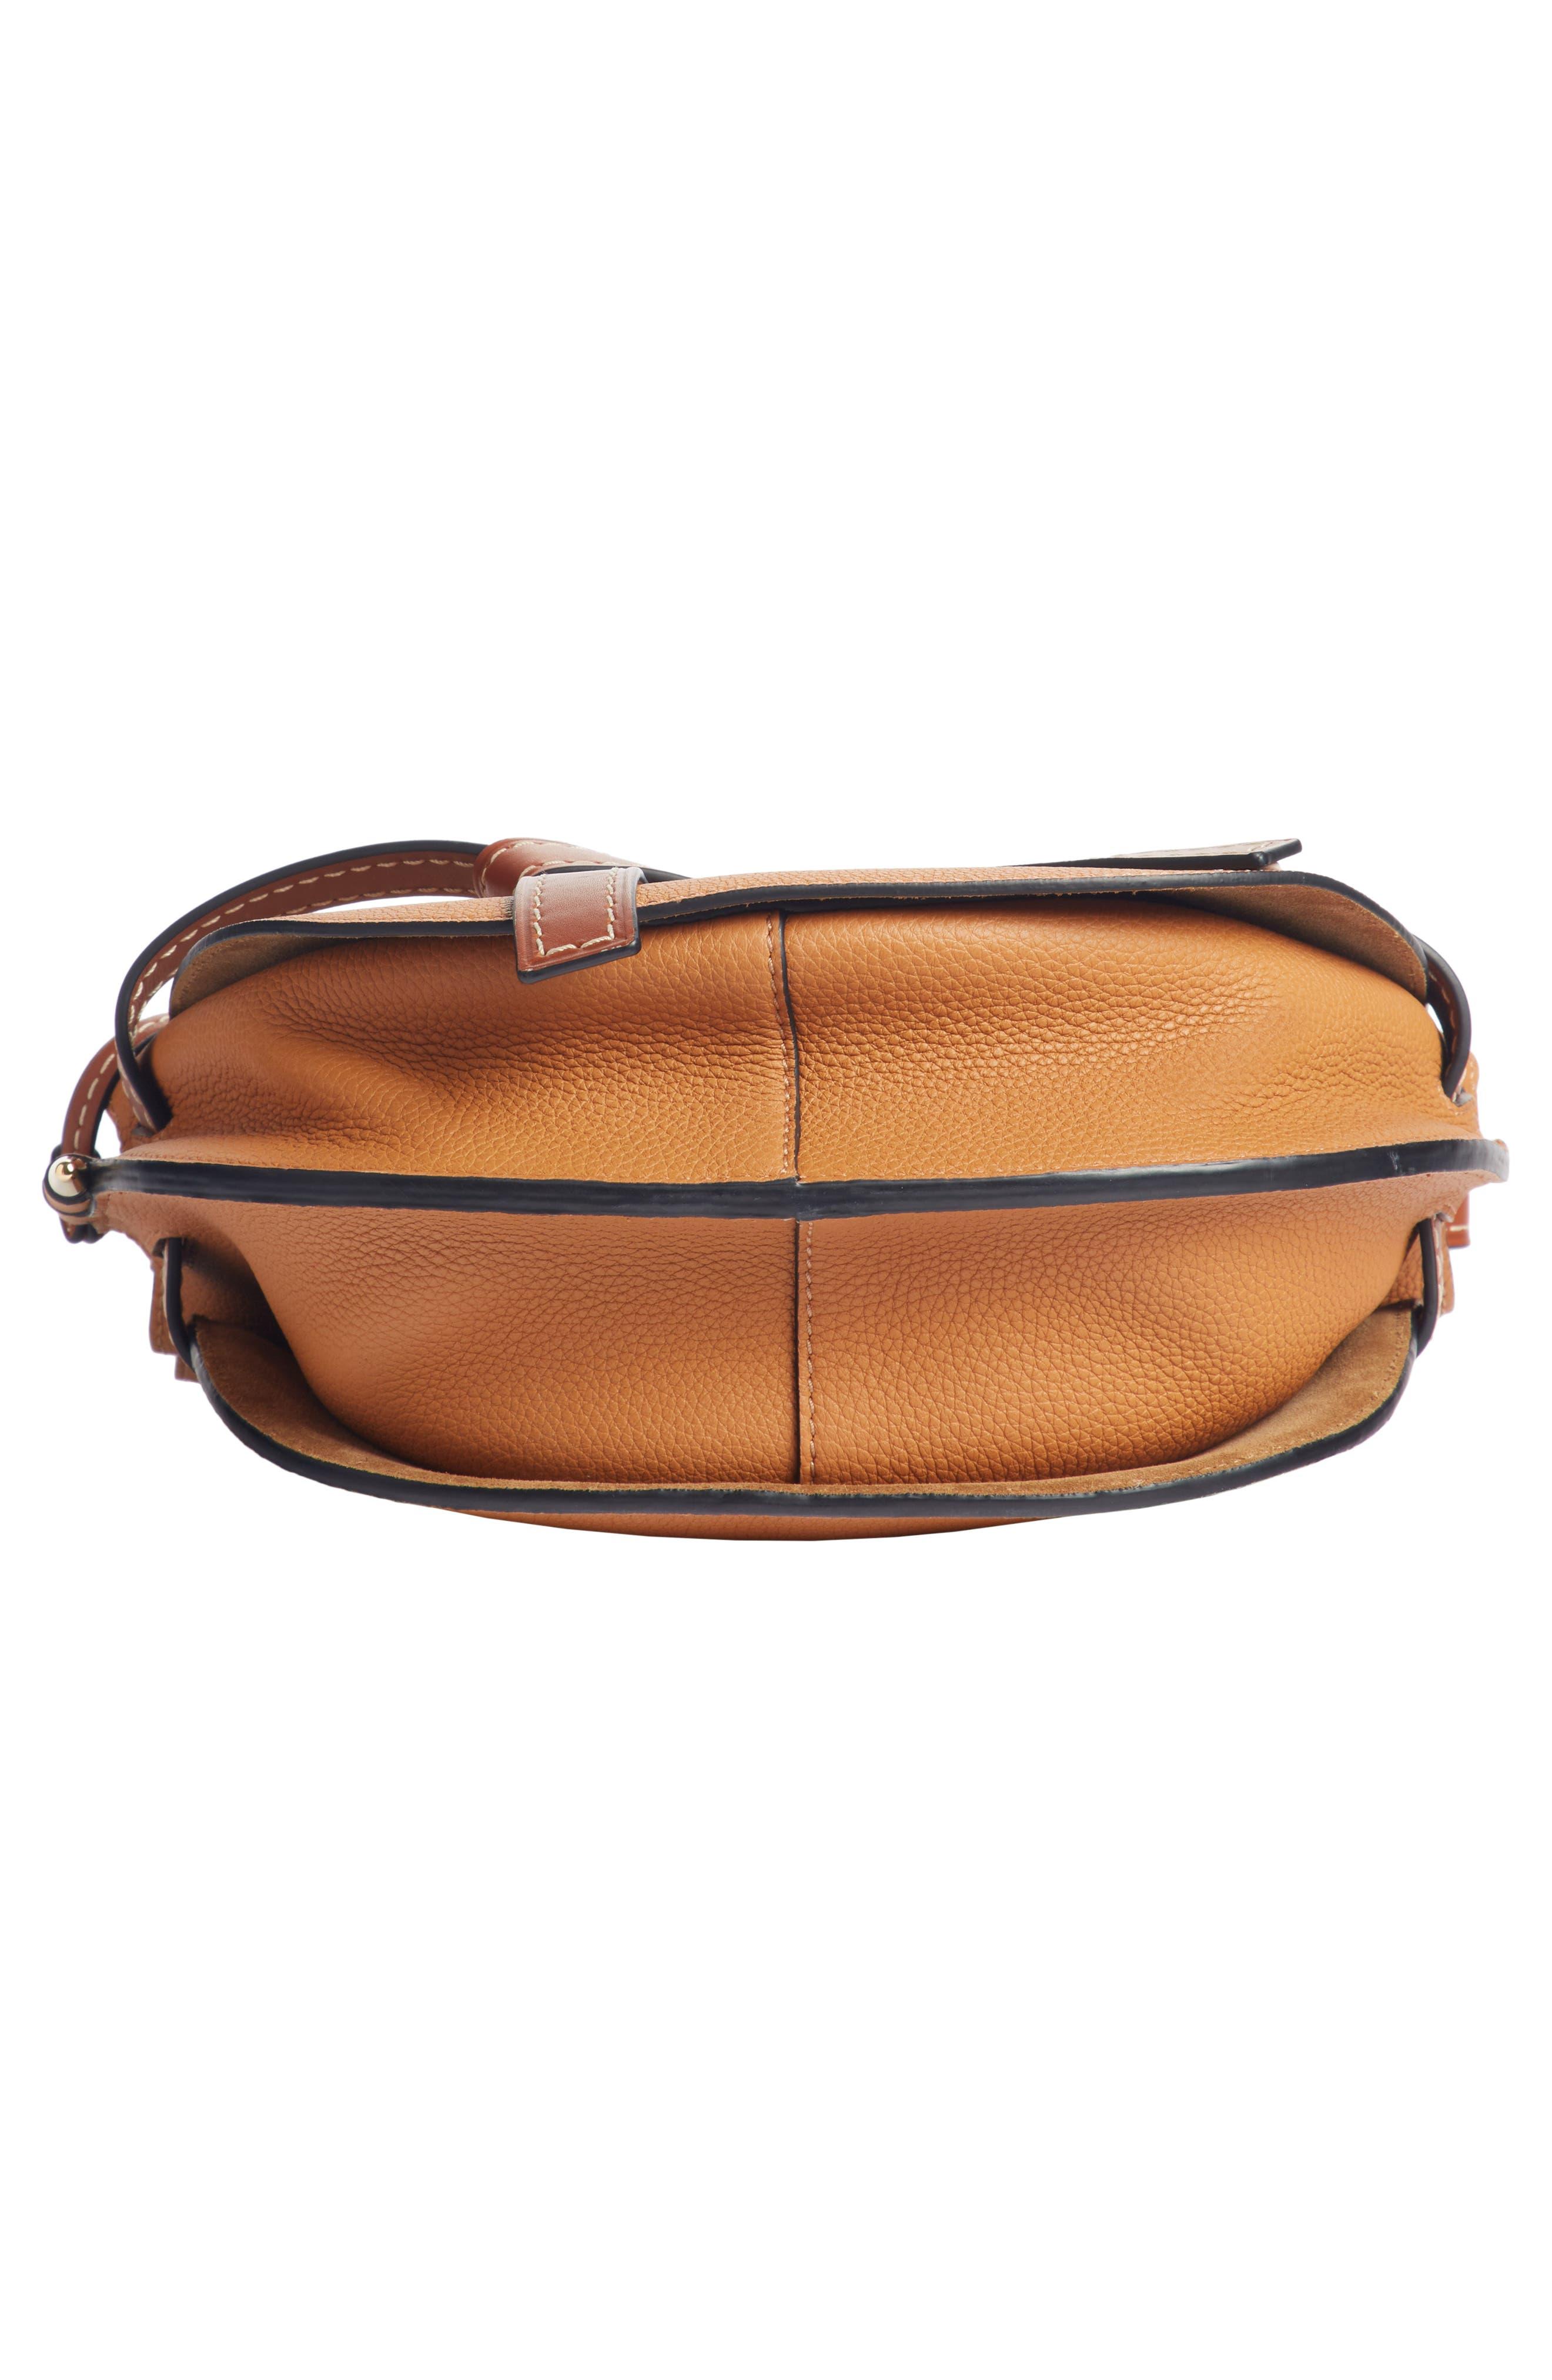 LOEWE,                             Small Gate Leather Crossbody Bag,                             Alternate thumbnail 5, color,                             LIGHT CARAMEL/ PECAN